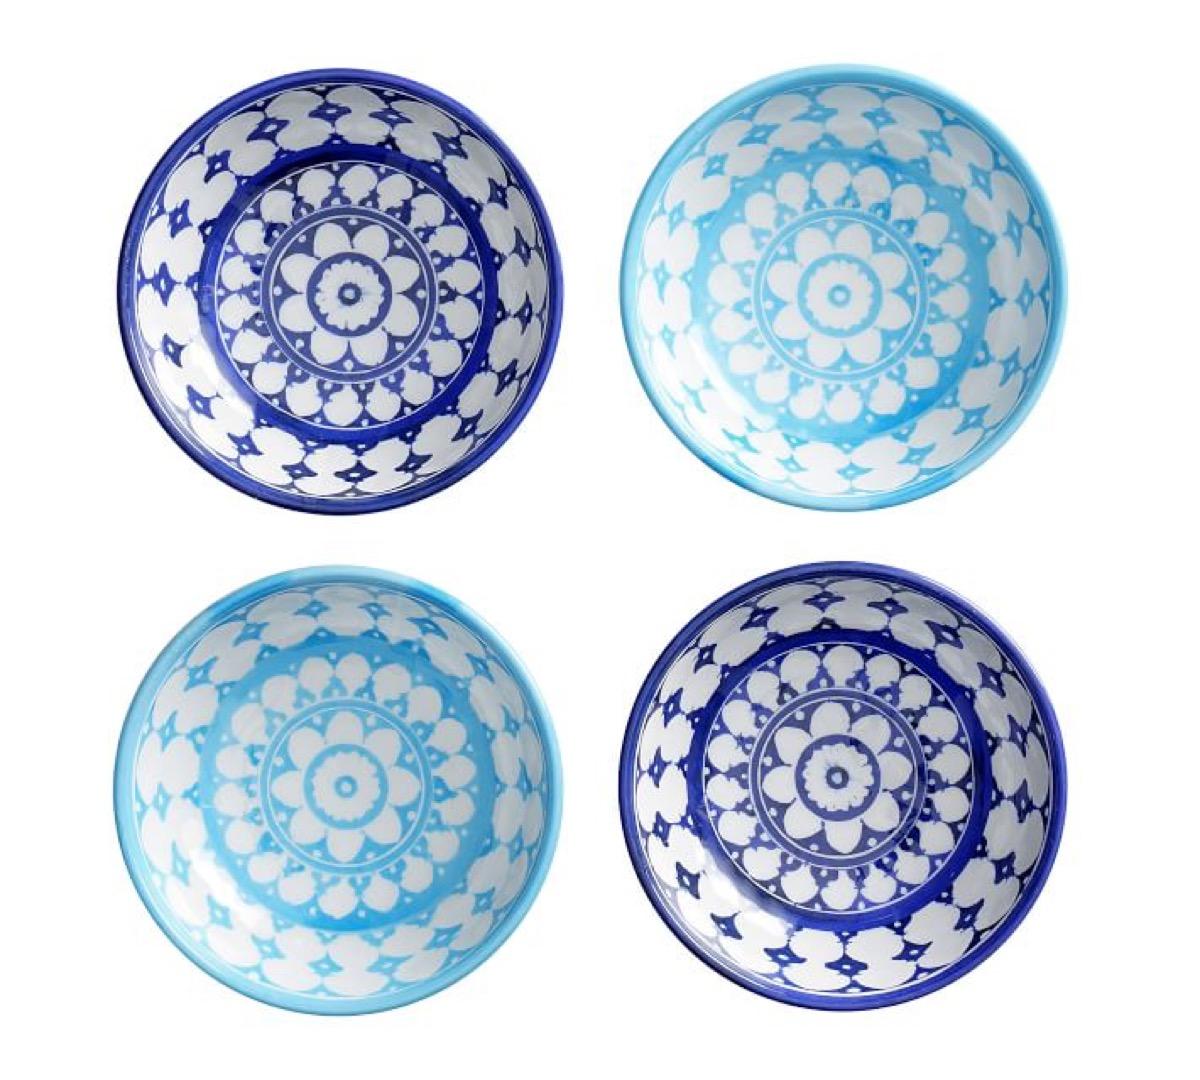 melamine dipping bowls, picnic essentials